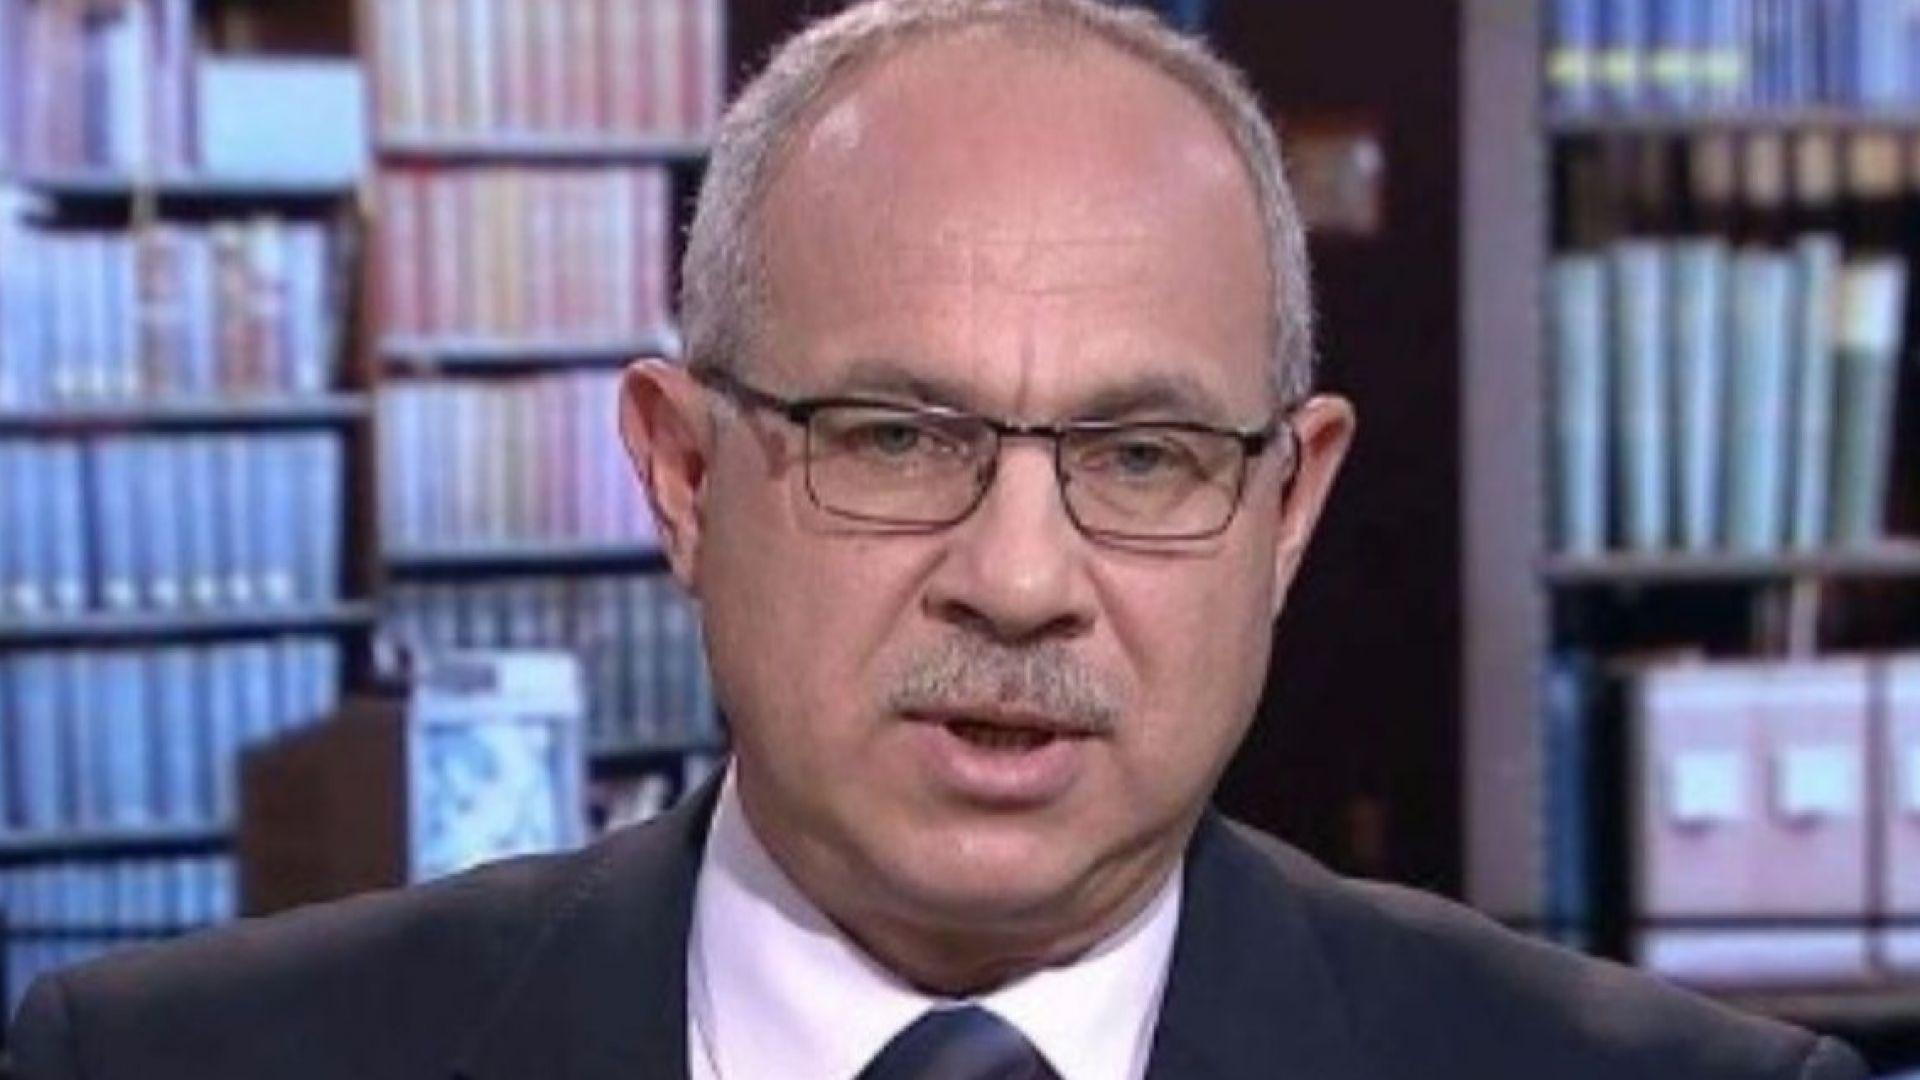 ГЕРБ извади срещу БСП Боляровогейт